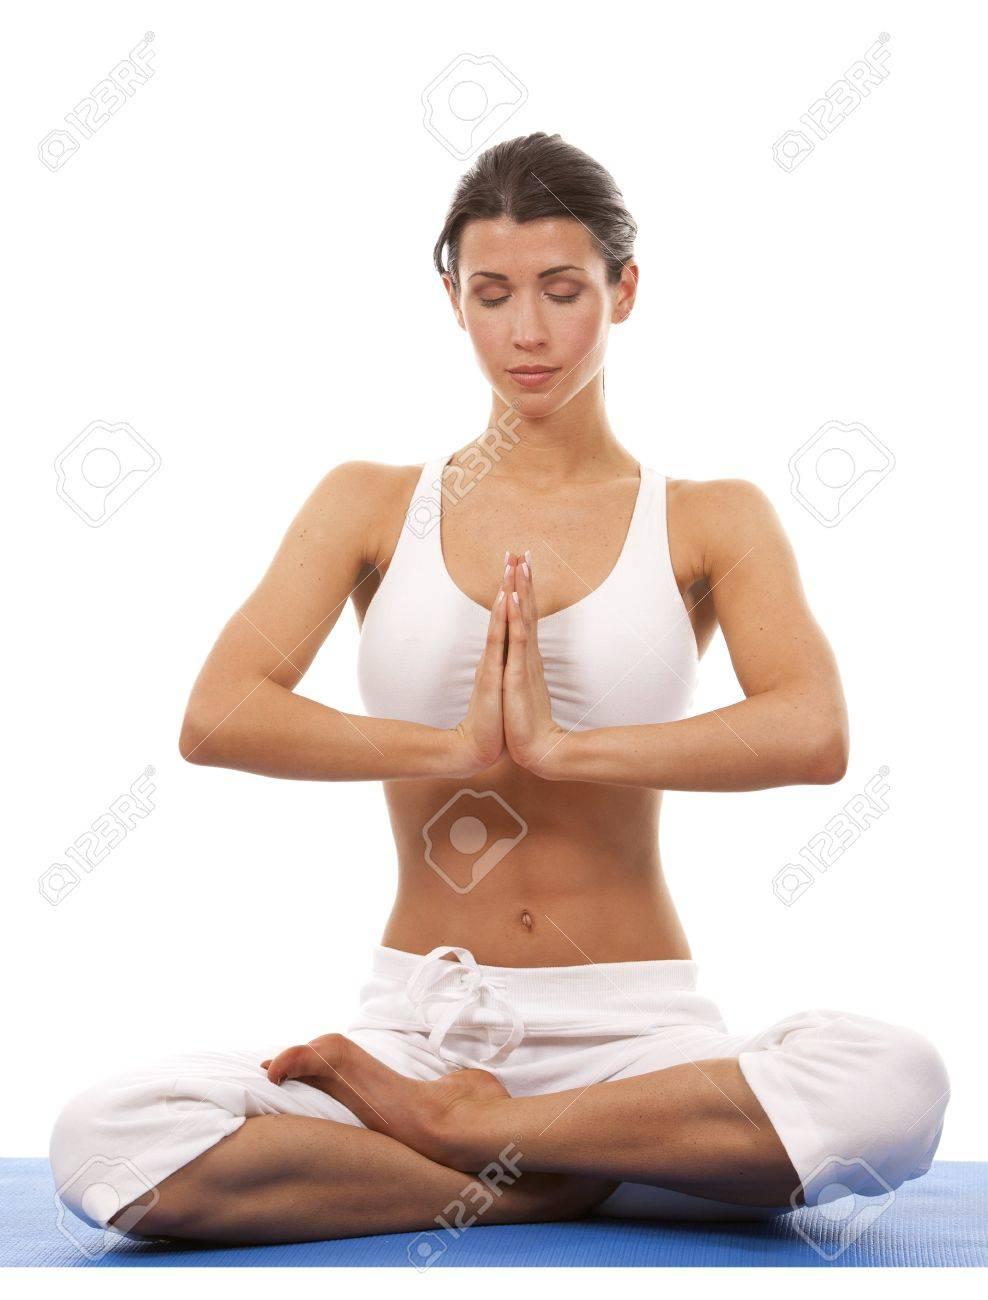 pretty brunette is exercising yoga on white background Stock Photo - 19356855